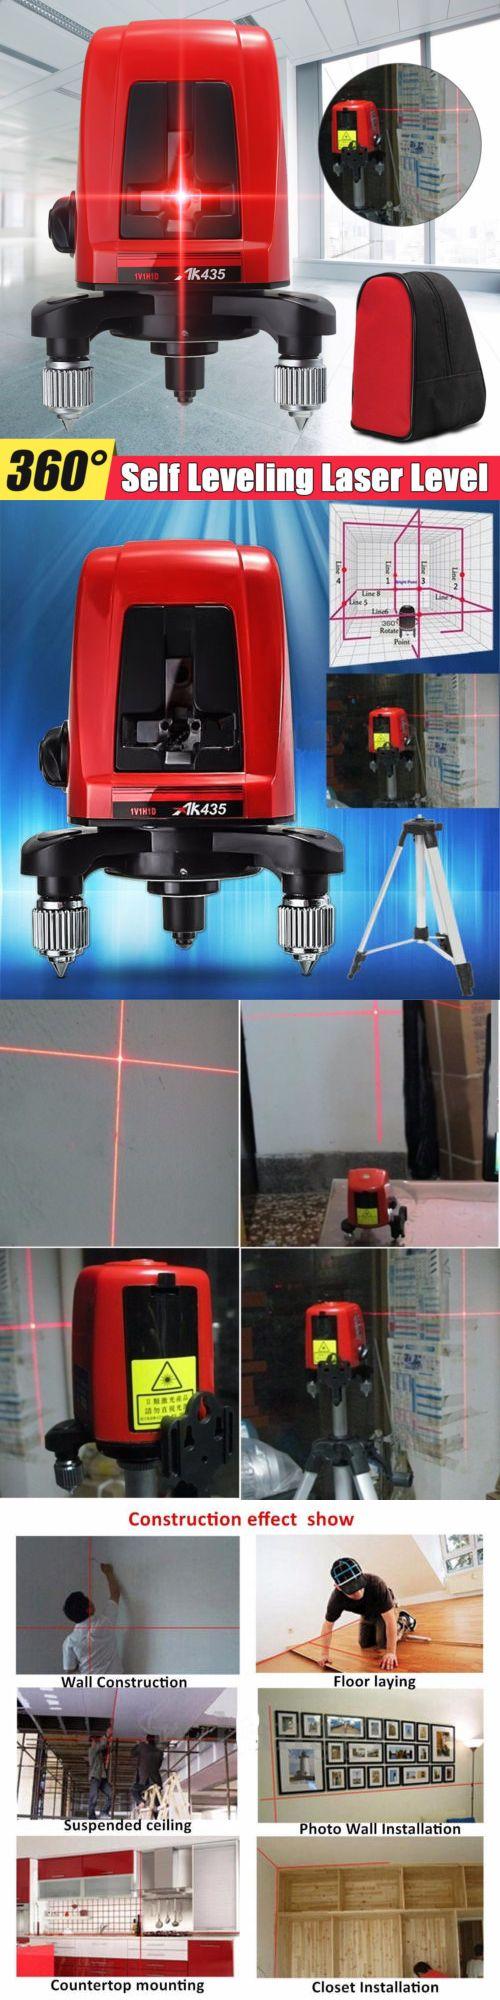 Laser Measuring Tools 126396 Ak435 360 Degree Self Leveling Cross Laser Level 2 Line 1 Point Package Bag Us Buy It N Laser Levels Measuring Tools Usa Bag